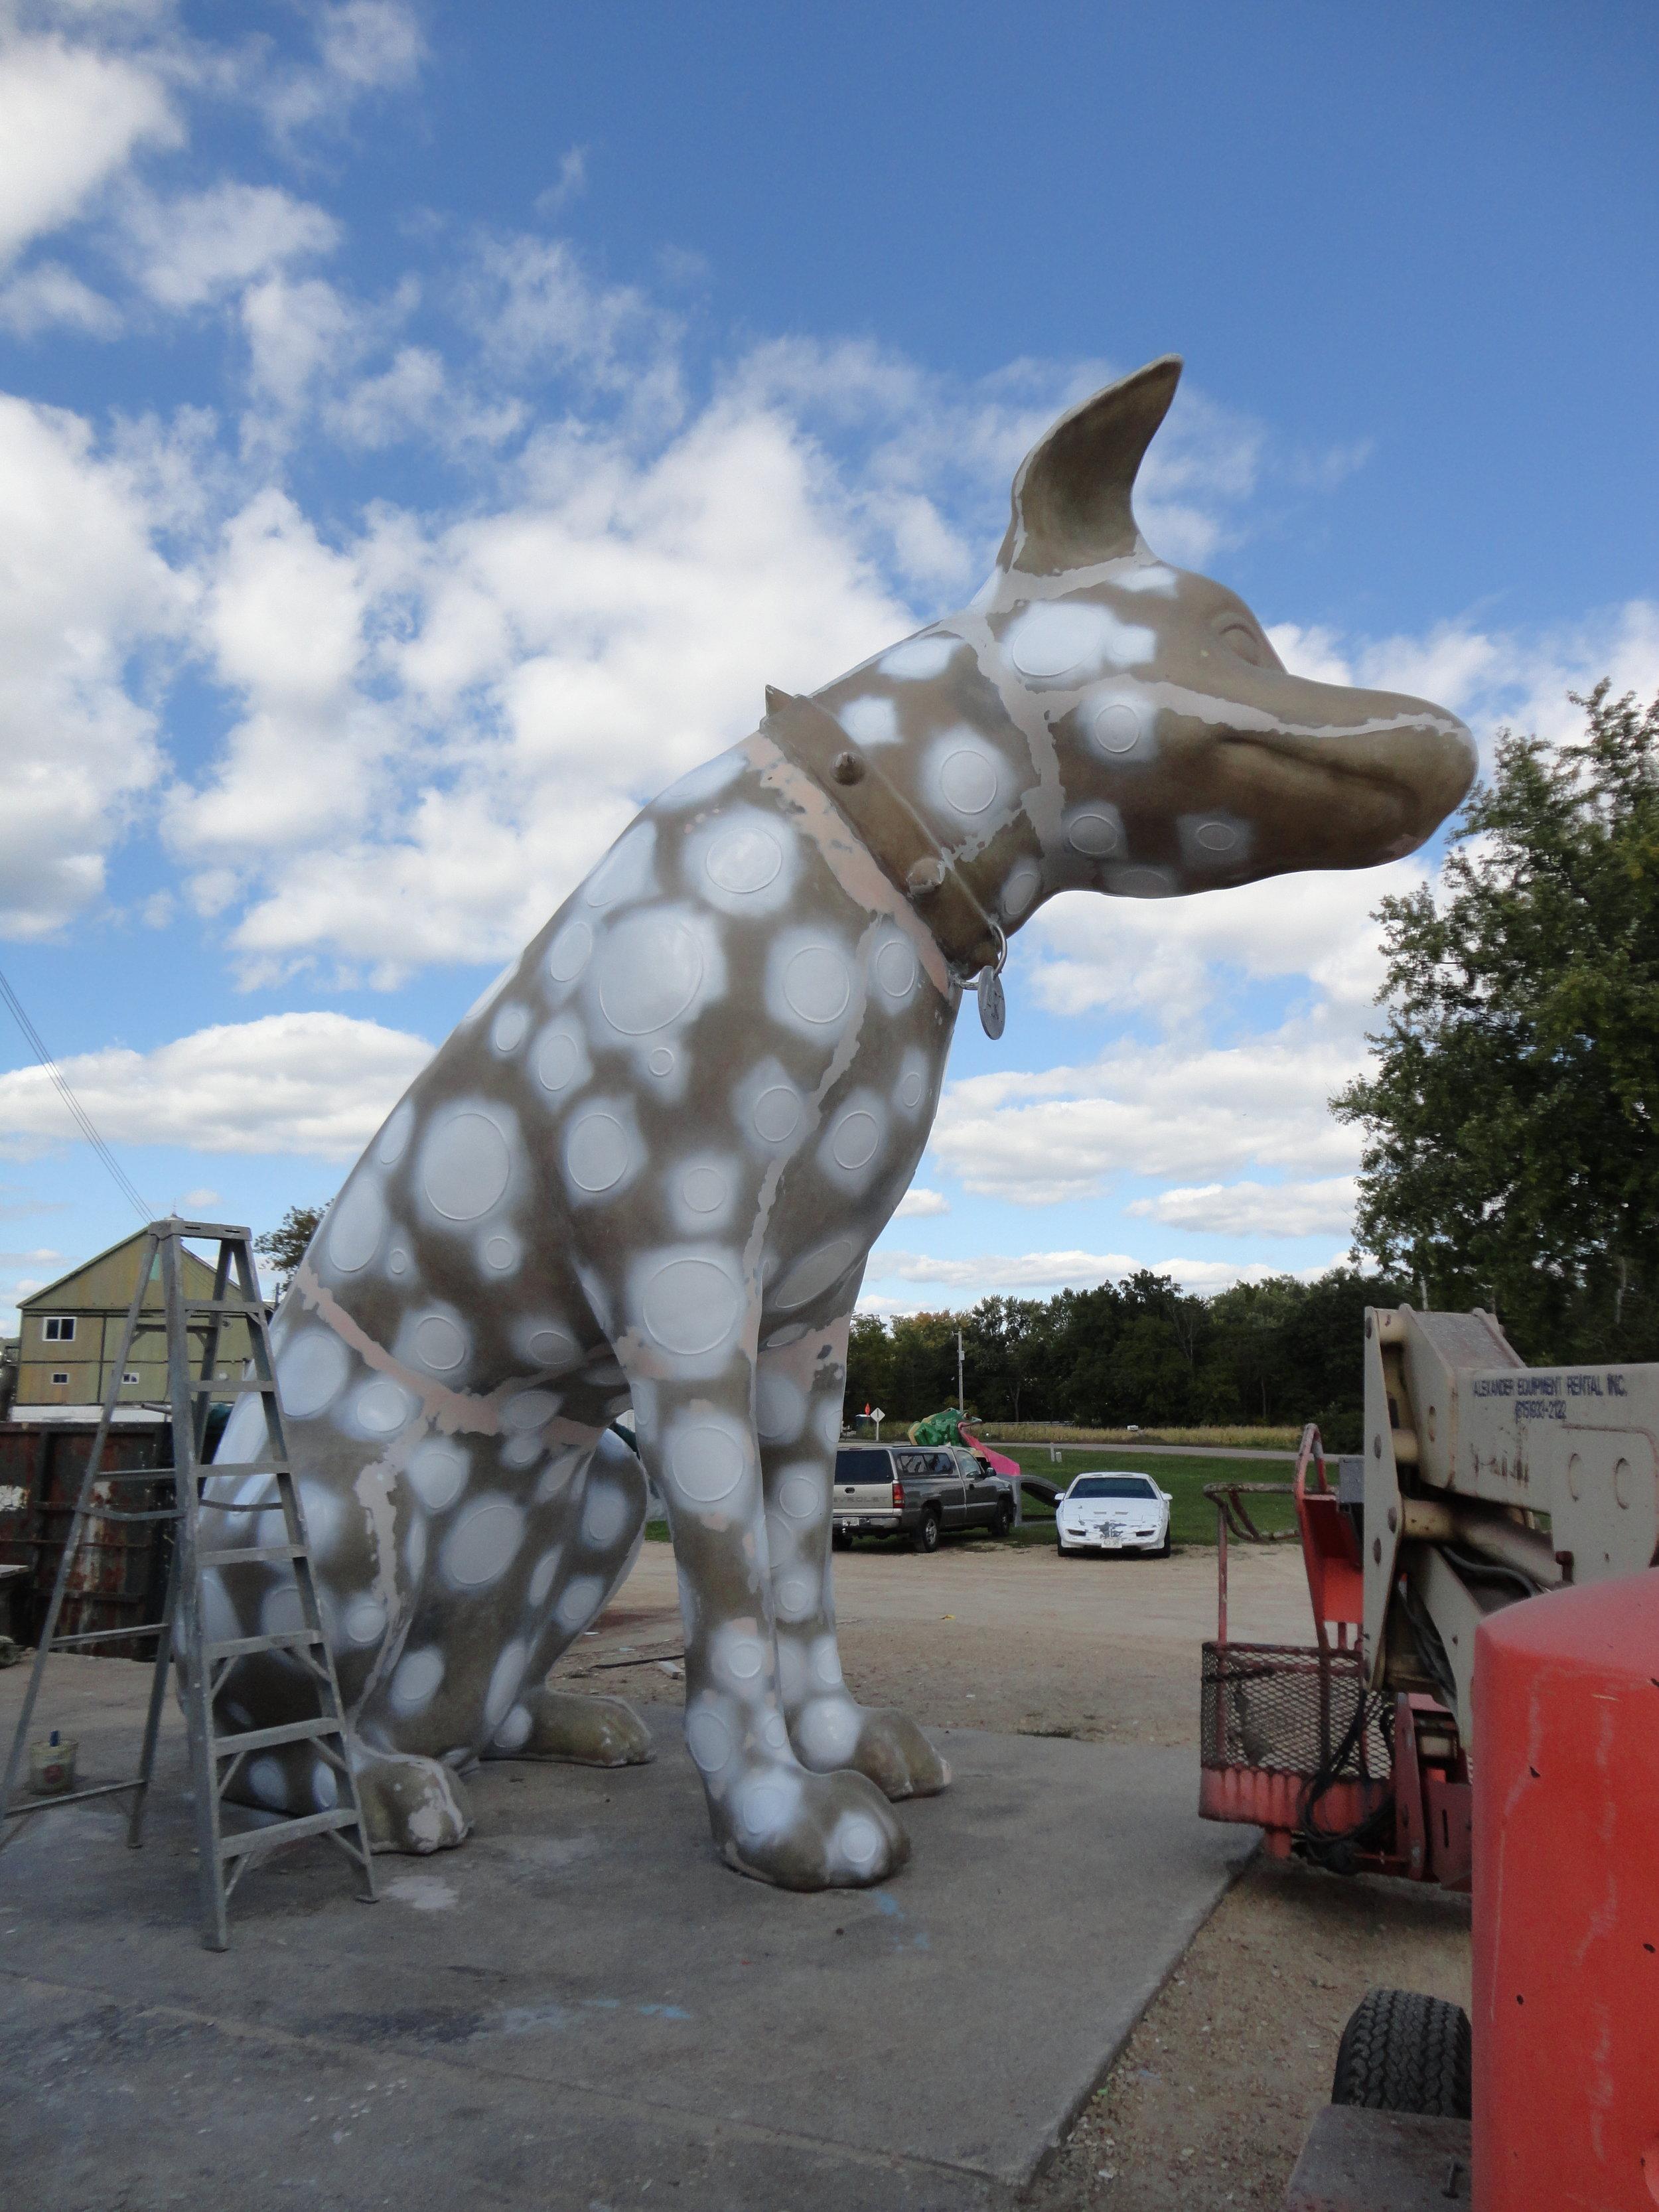 Shreveport_Art the Dalmation_Shreveport Regional Arts Council_Public Art Services_J Grant Projects_2.JPG